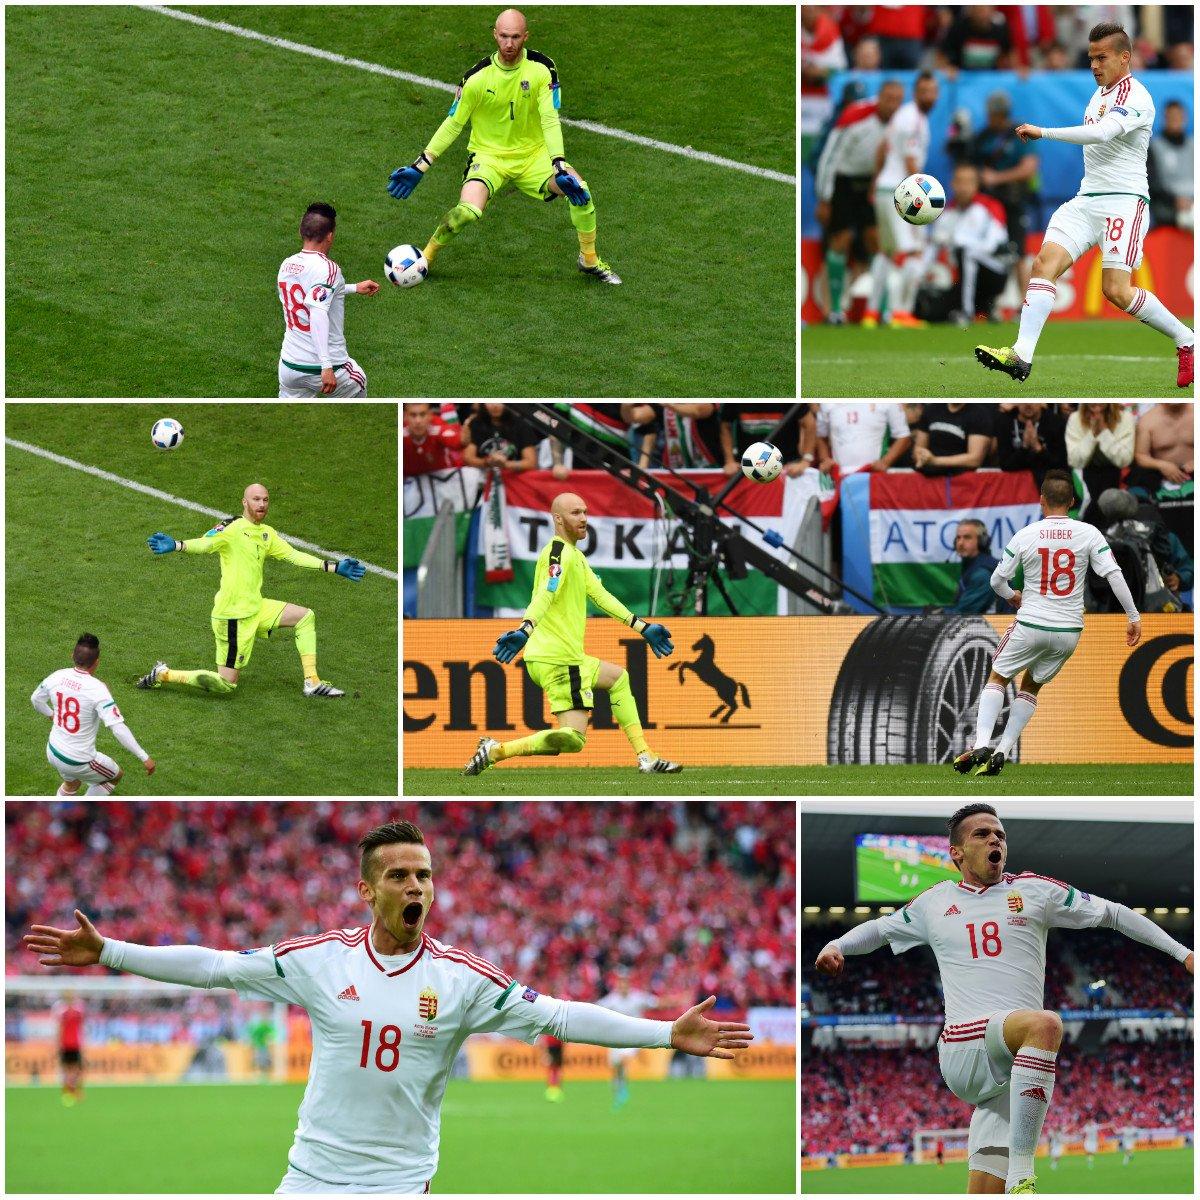 focieb_2016_magyarosztrak_golszerzok_az_uefa_twitteren.jpg